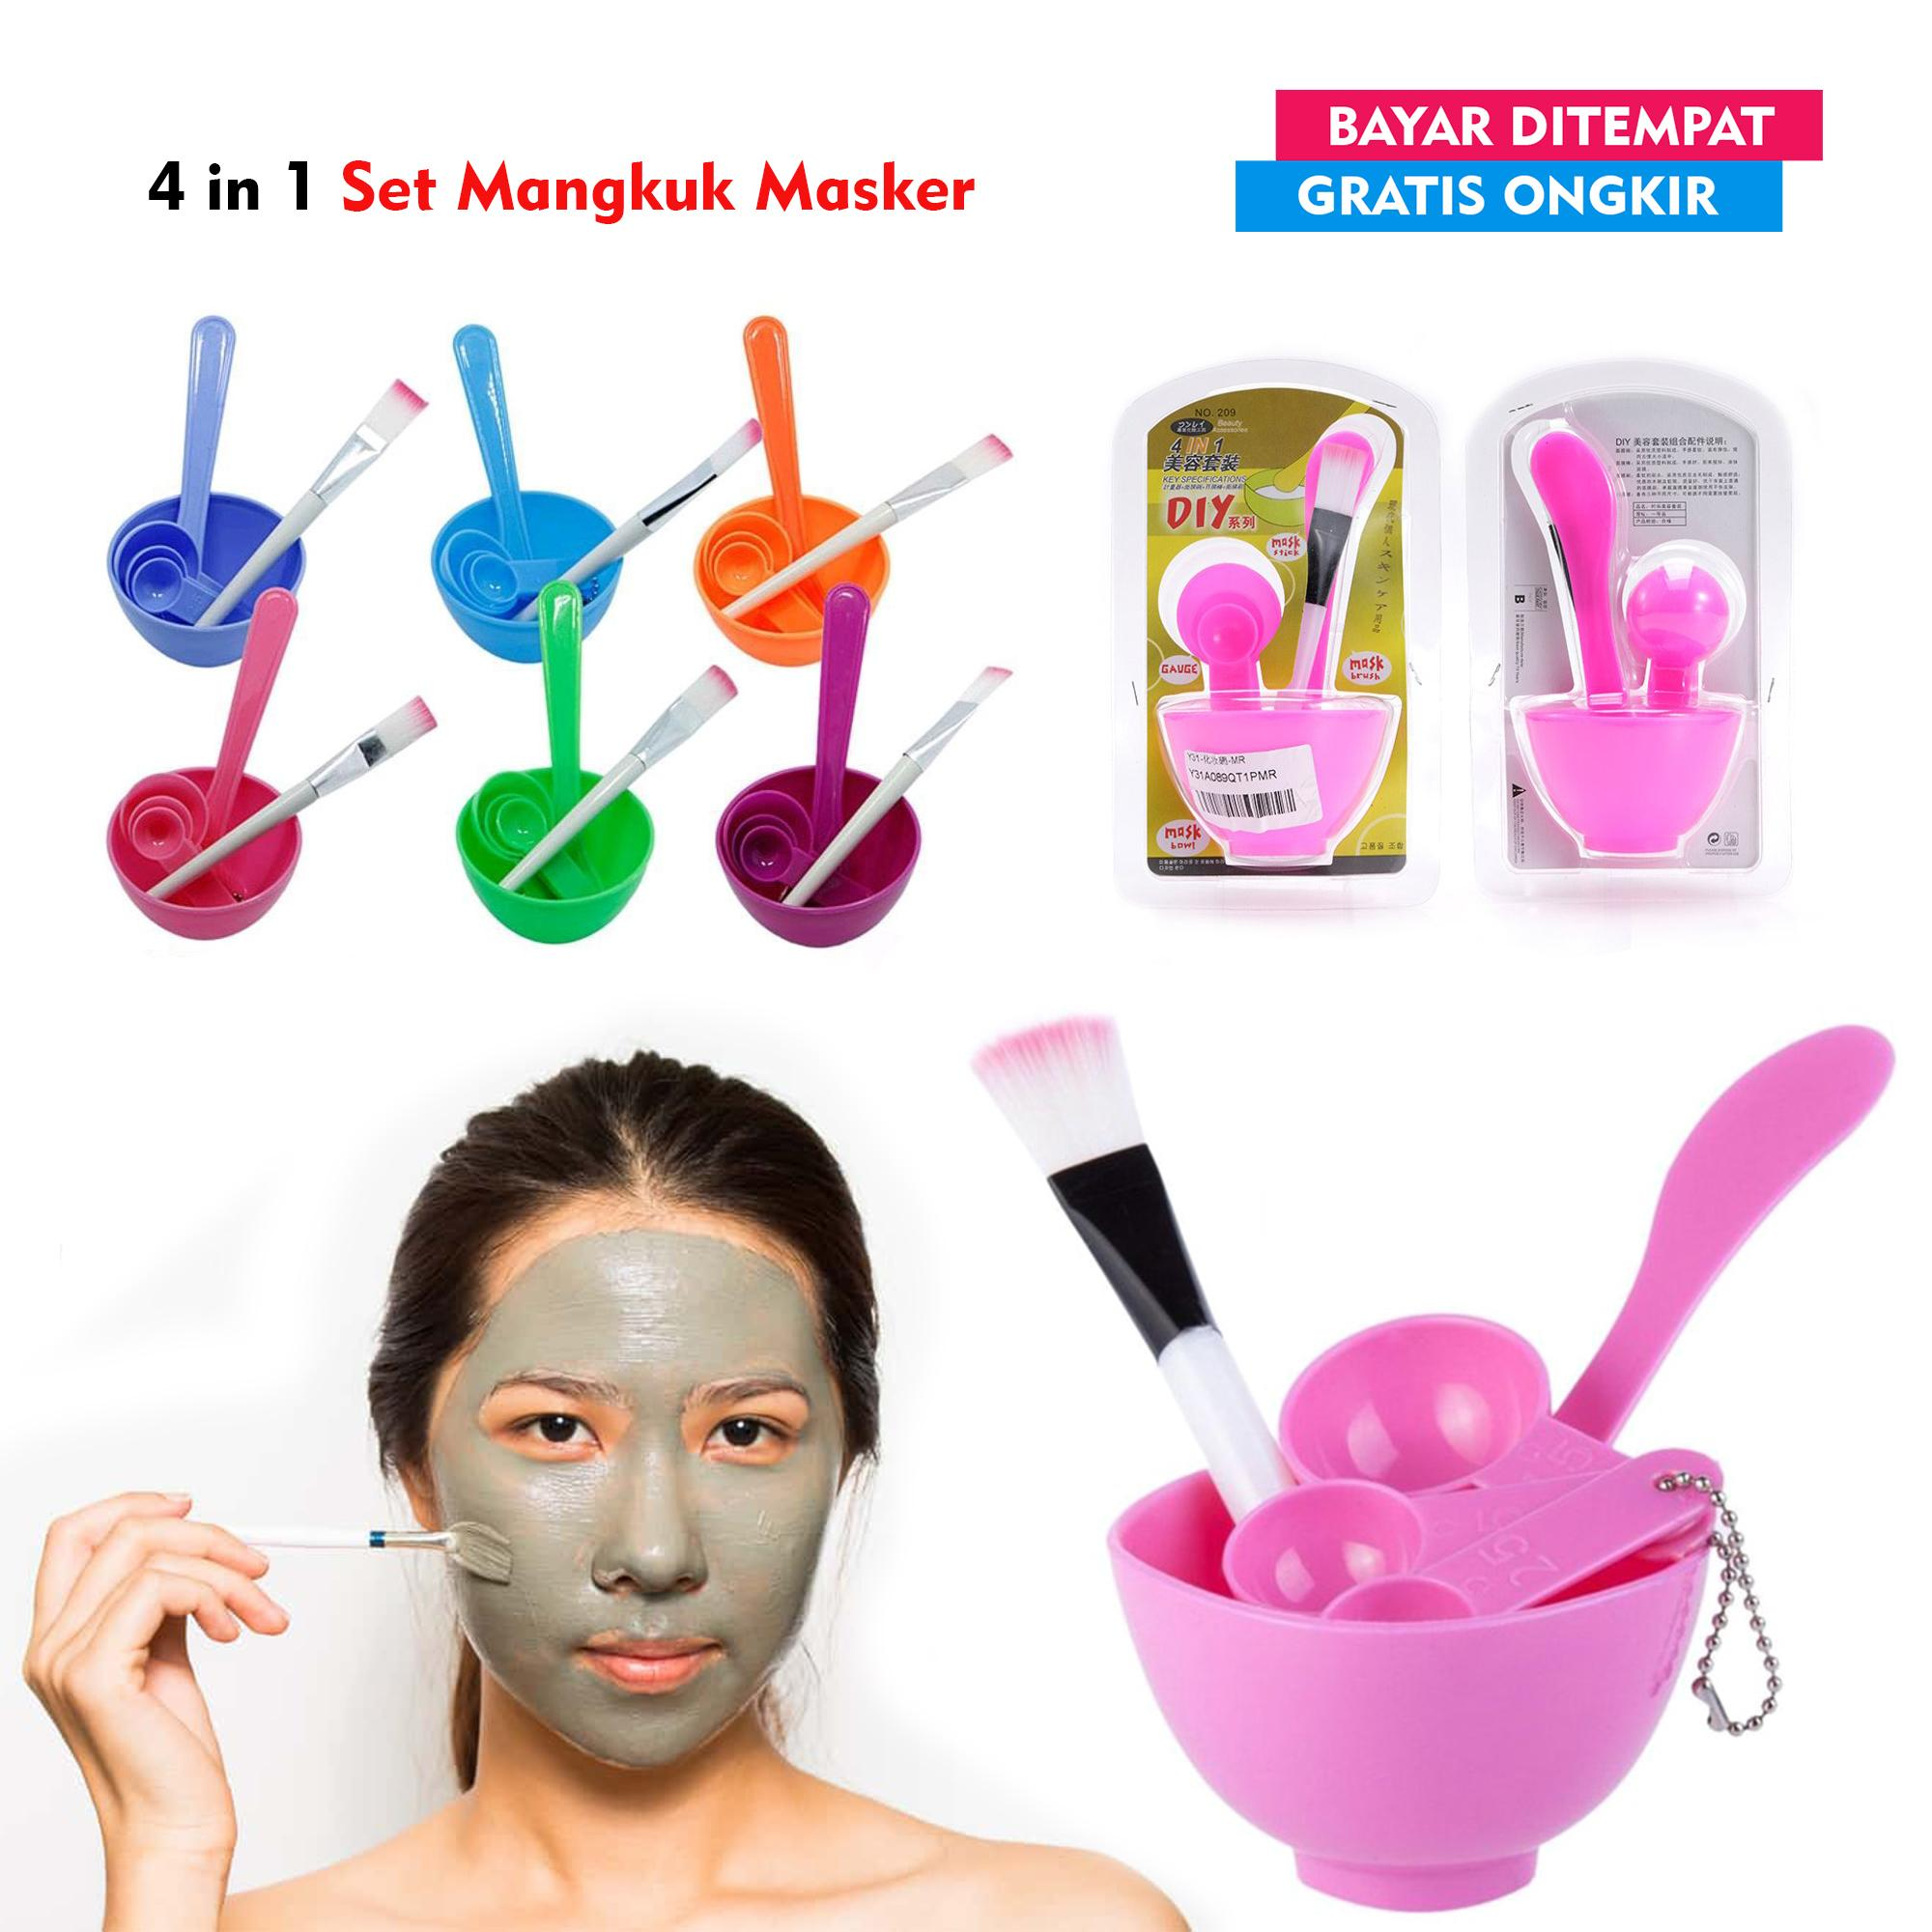 Rainbow Mangkok Masker SET 4 in 1 / Kuas Masker/ Mangkuk Masker Wajah / Tempat Masker / Kuas dan Mangkuk Masker - Random - Alibabeh | Lazada Indonesia